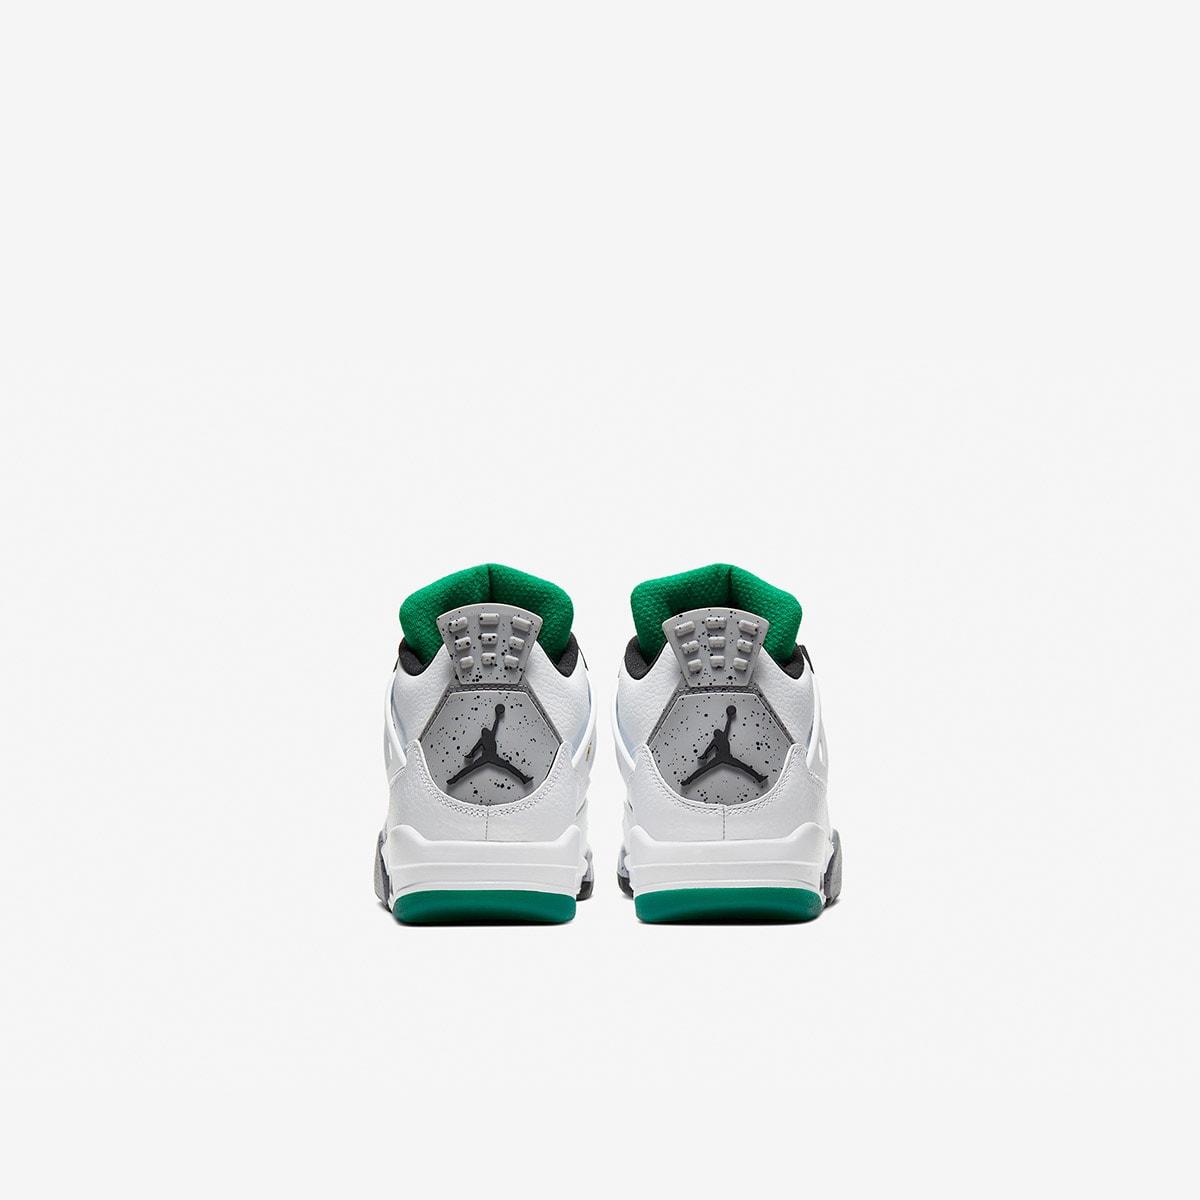 Air Jordan 4 Retro W - AG9129-100